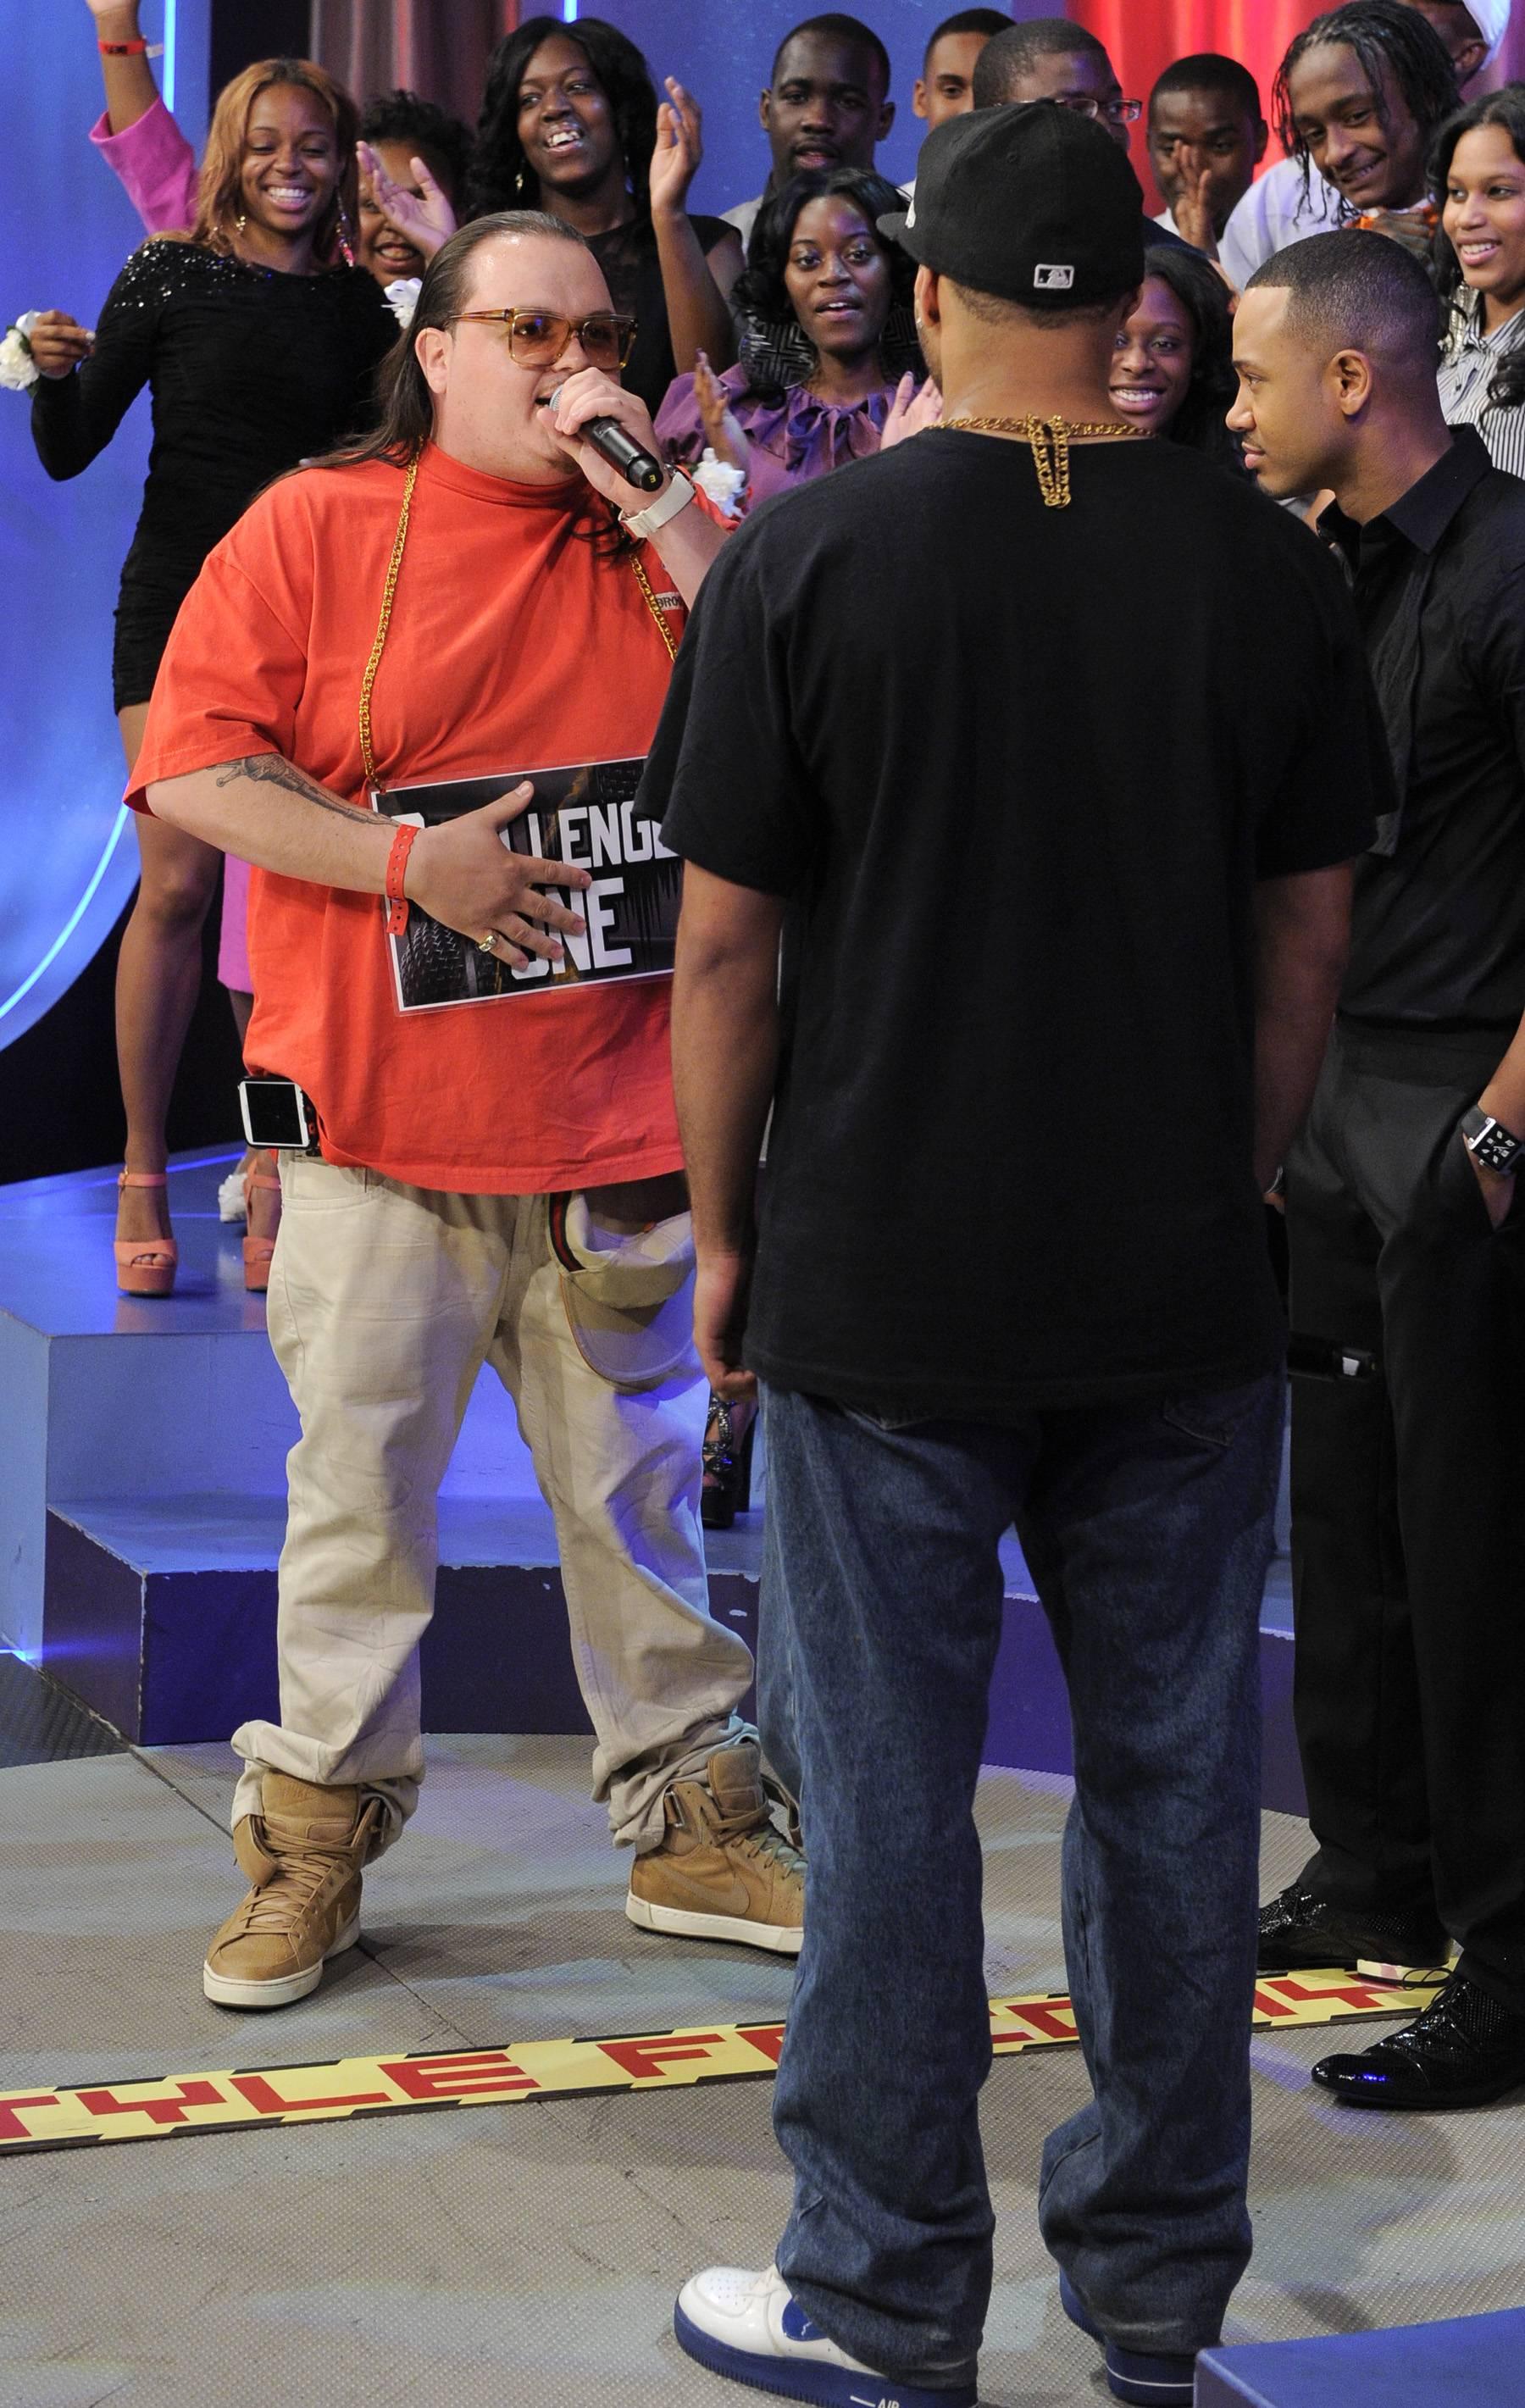 Fatz Breaks It Down - Freestyle Friday contestants Interstate Fatz and Jayo the Beatslayer at 106 & Park, May 25, 2012. (Photo: John Ricard / BET)